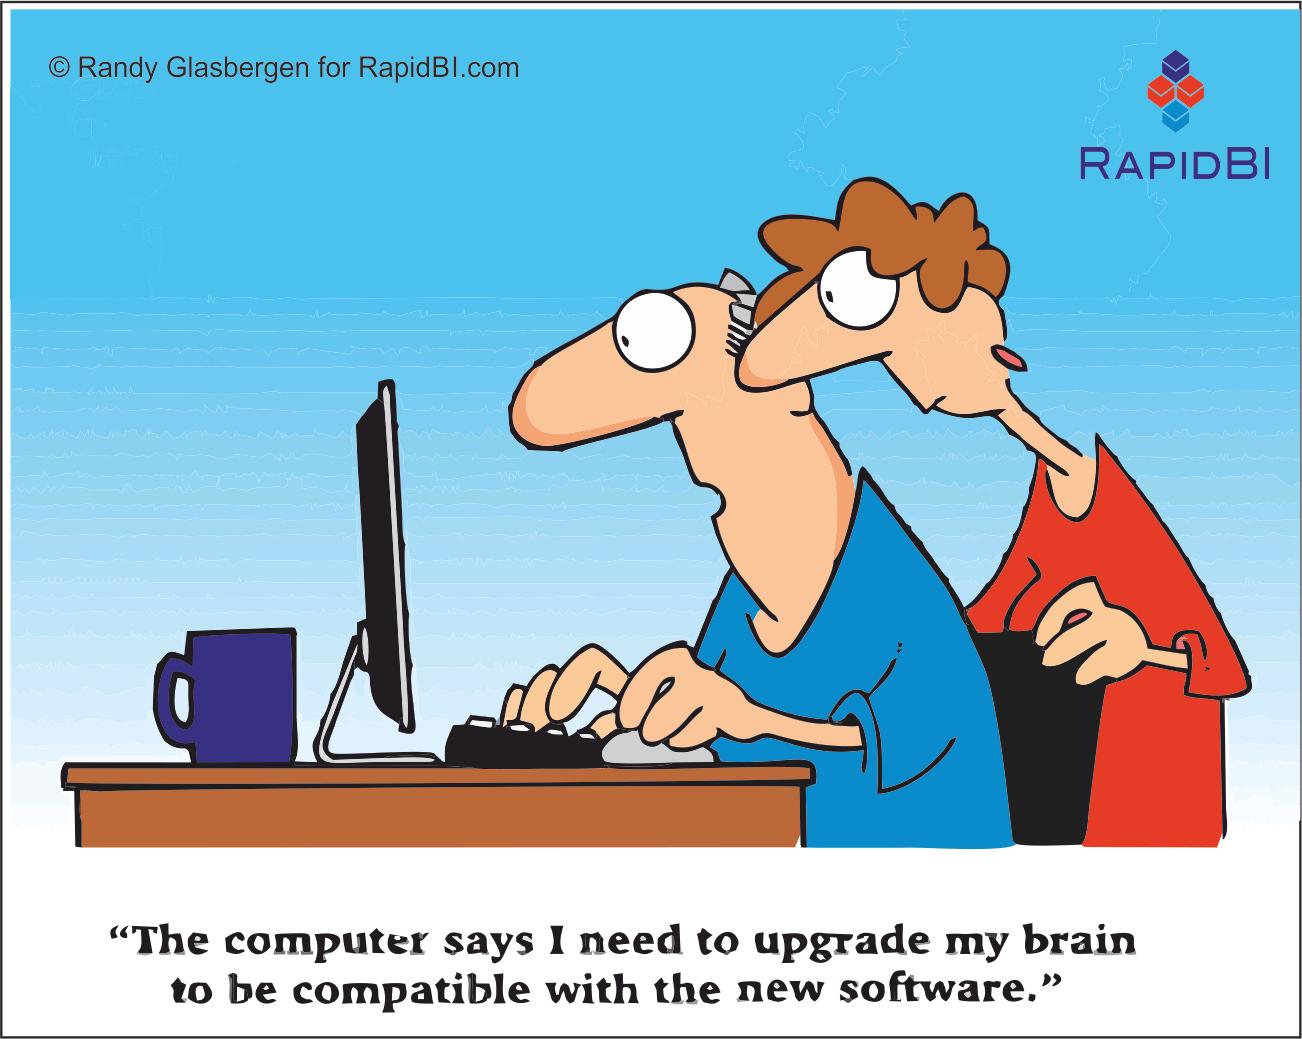 RapidBI Daily Cartoon #16